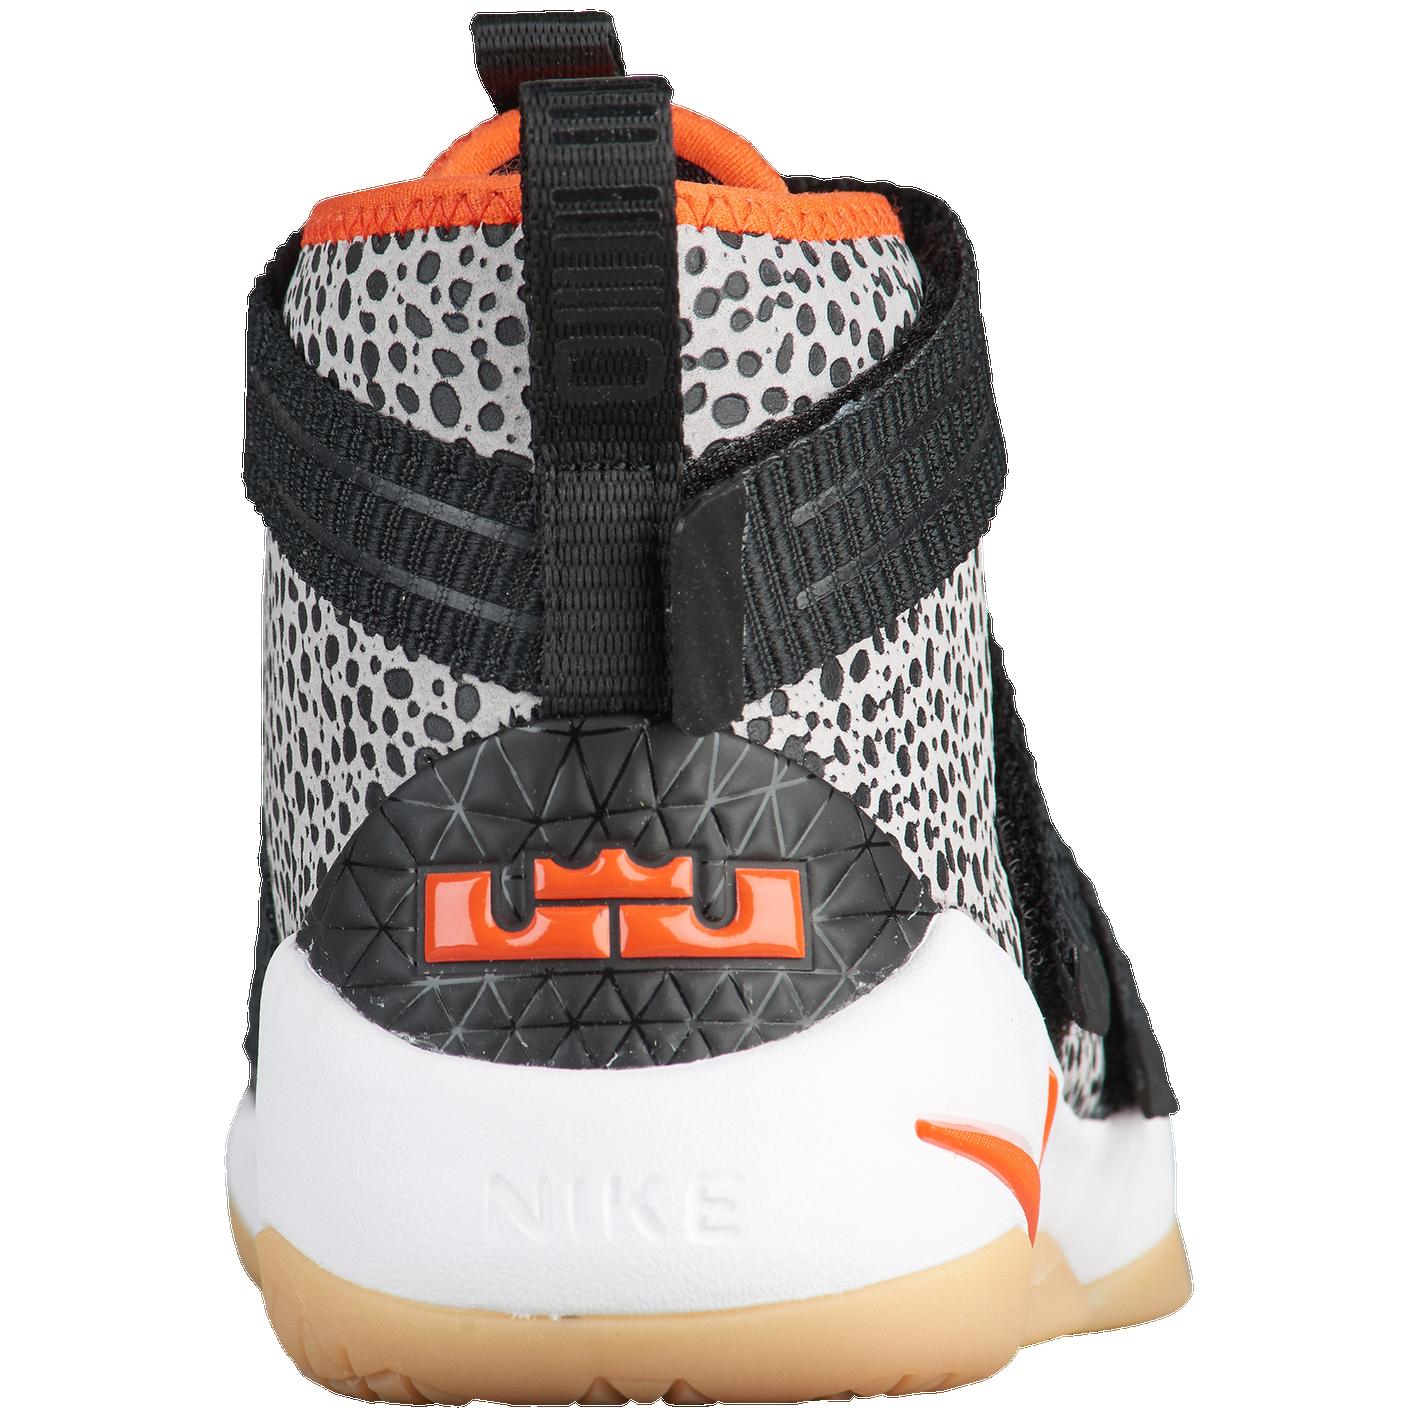 854098b23143 Nike LeBron Soldier XI SFG - Boys  Preschool - Basketball - Shoes ...